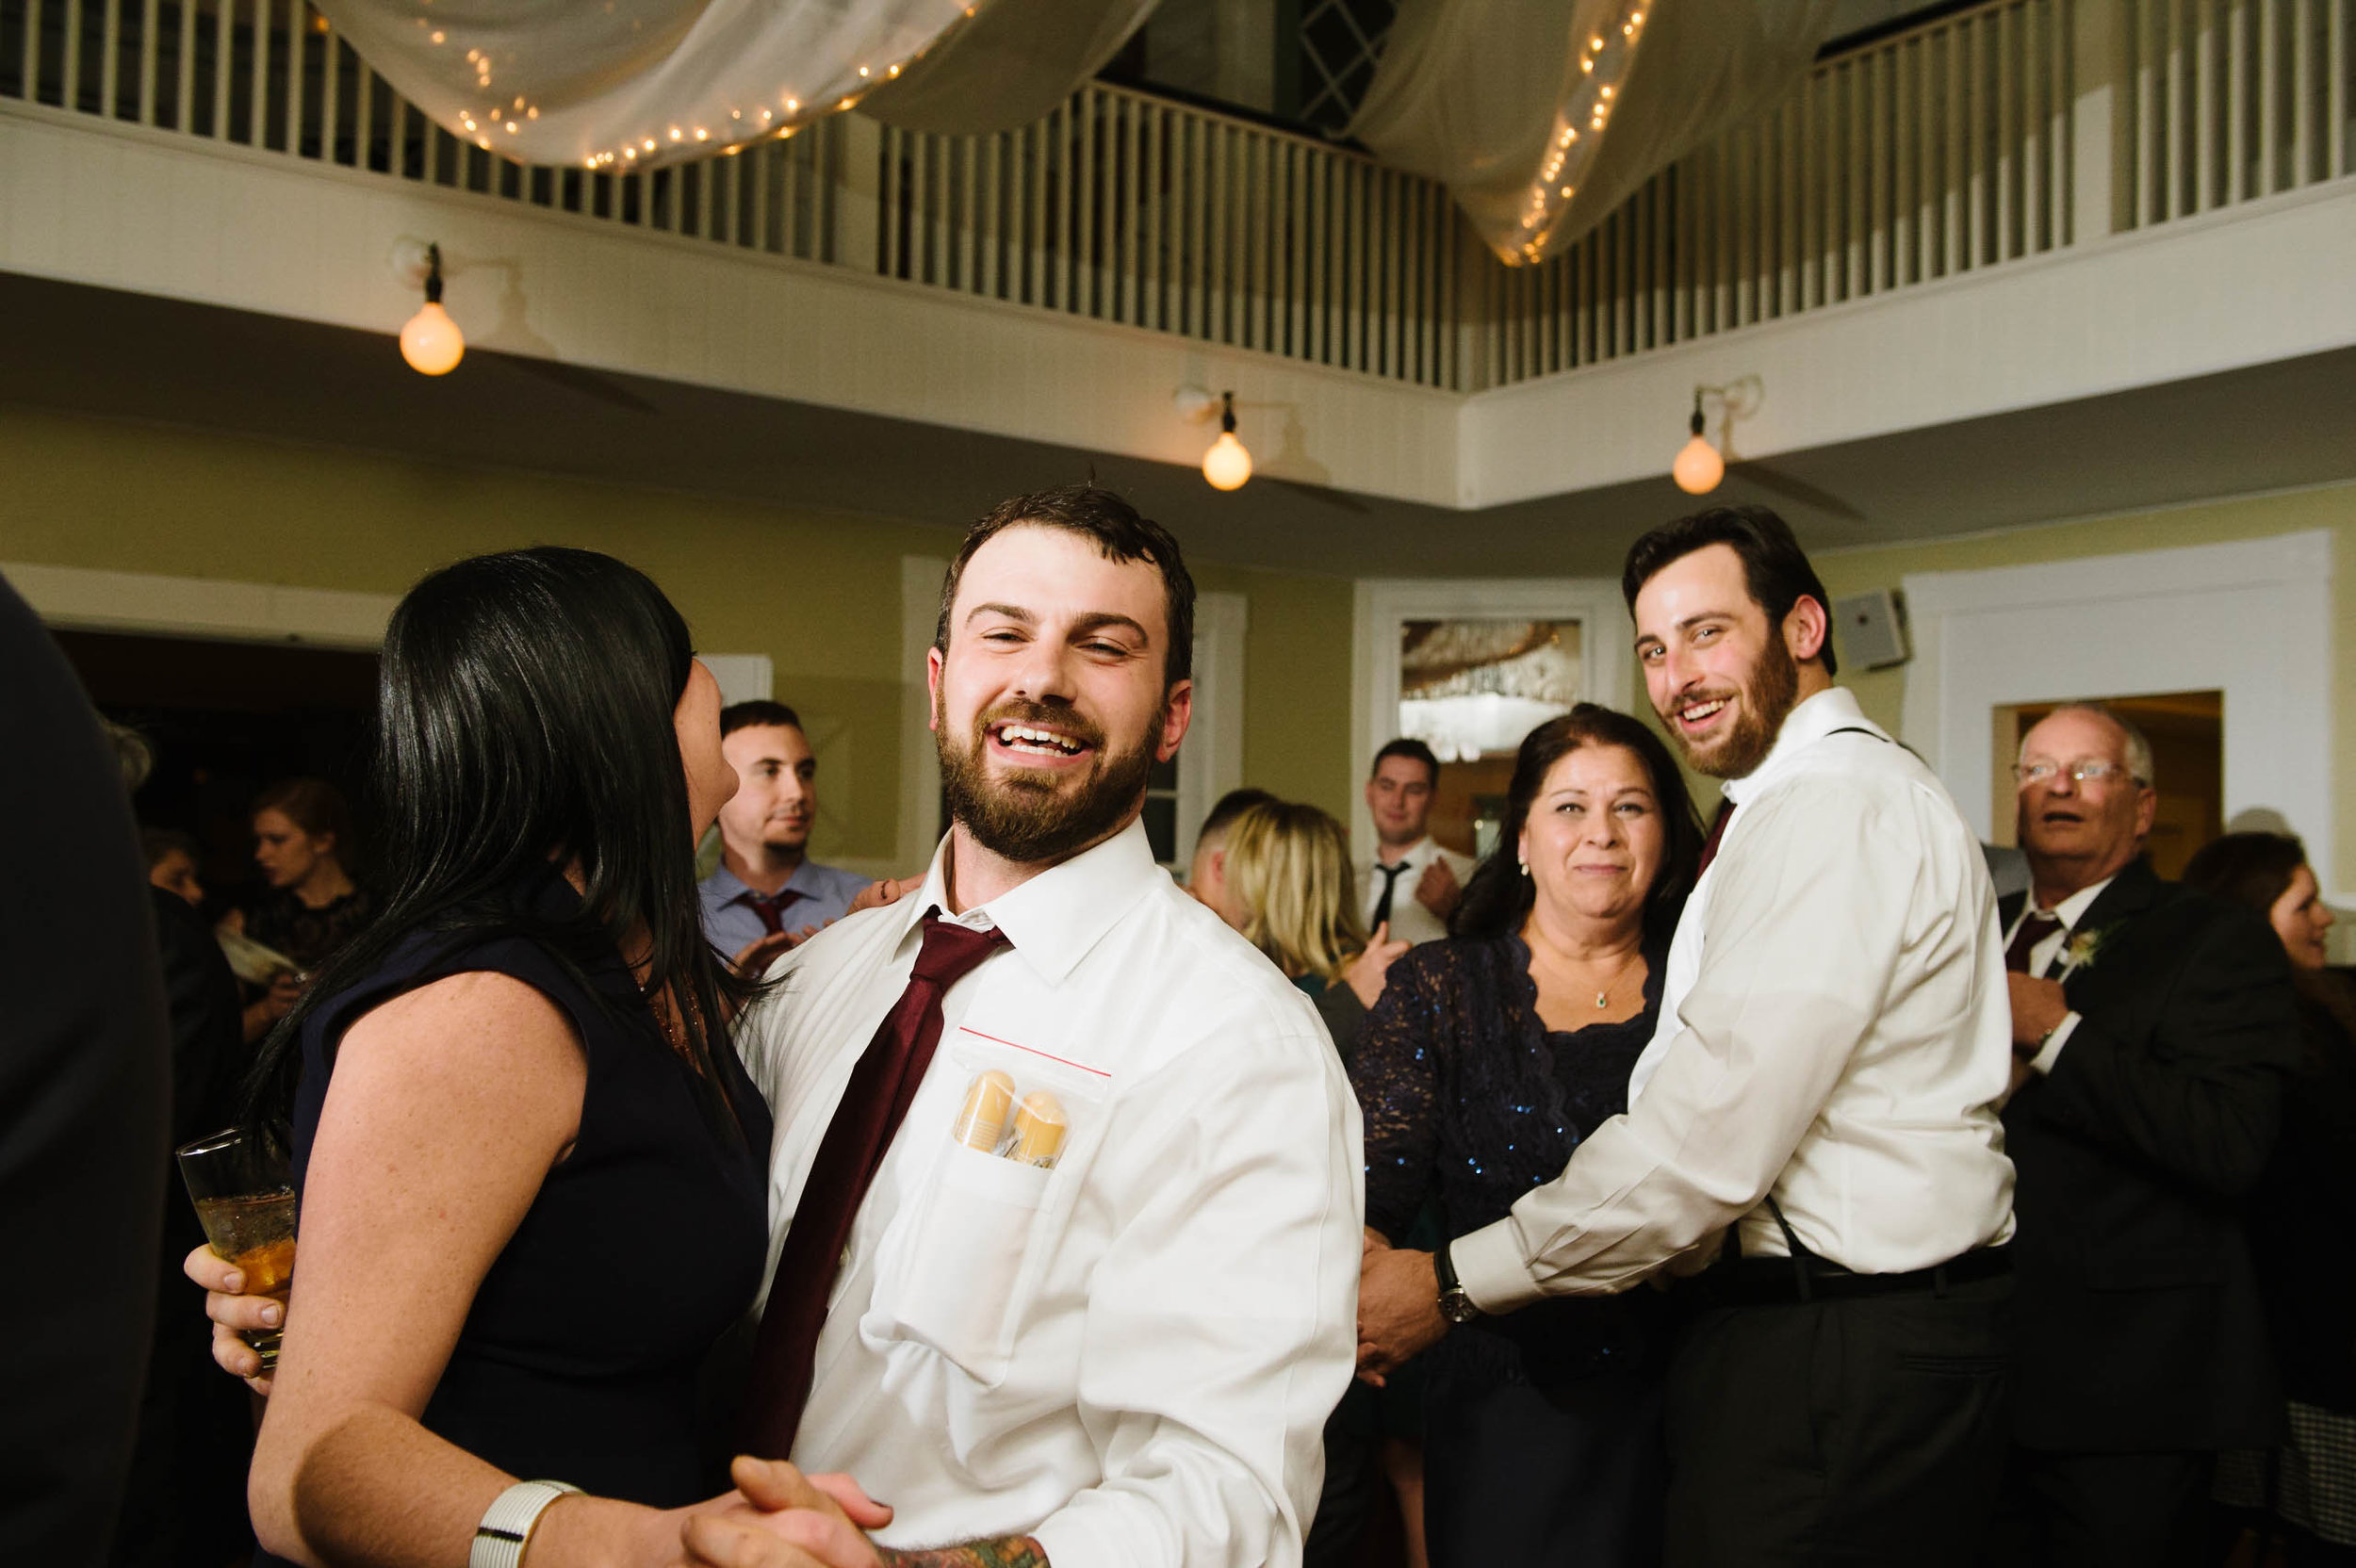 Masschusetts-Creative-Wedding27.jpg